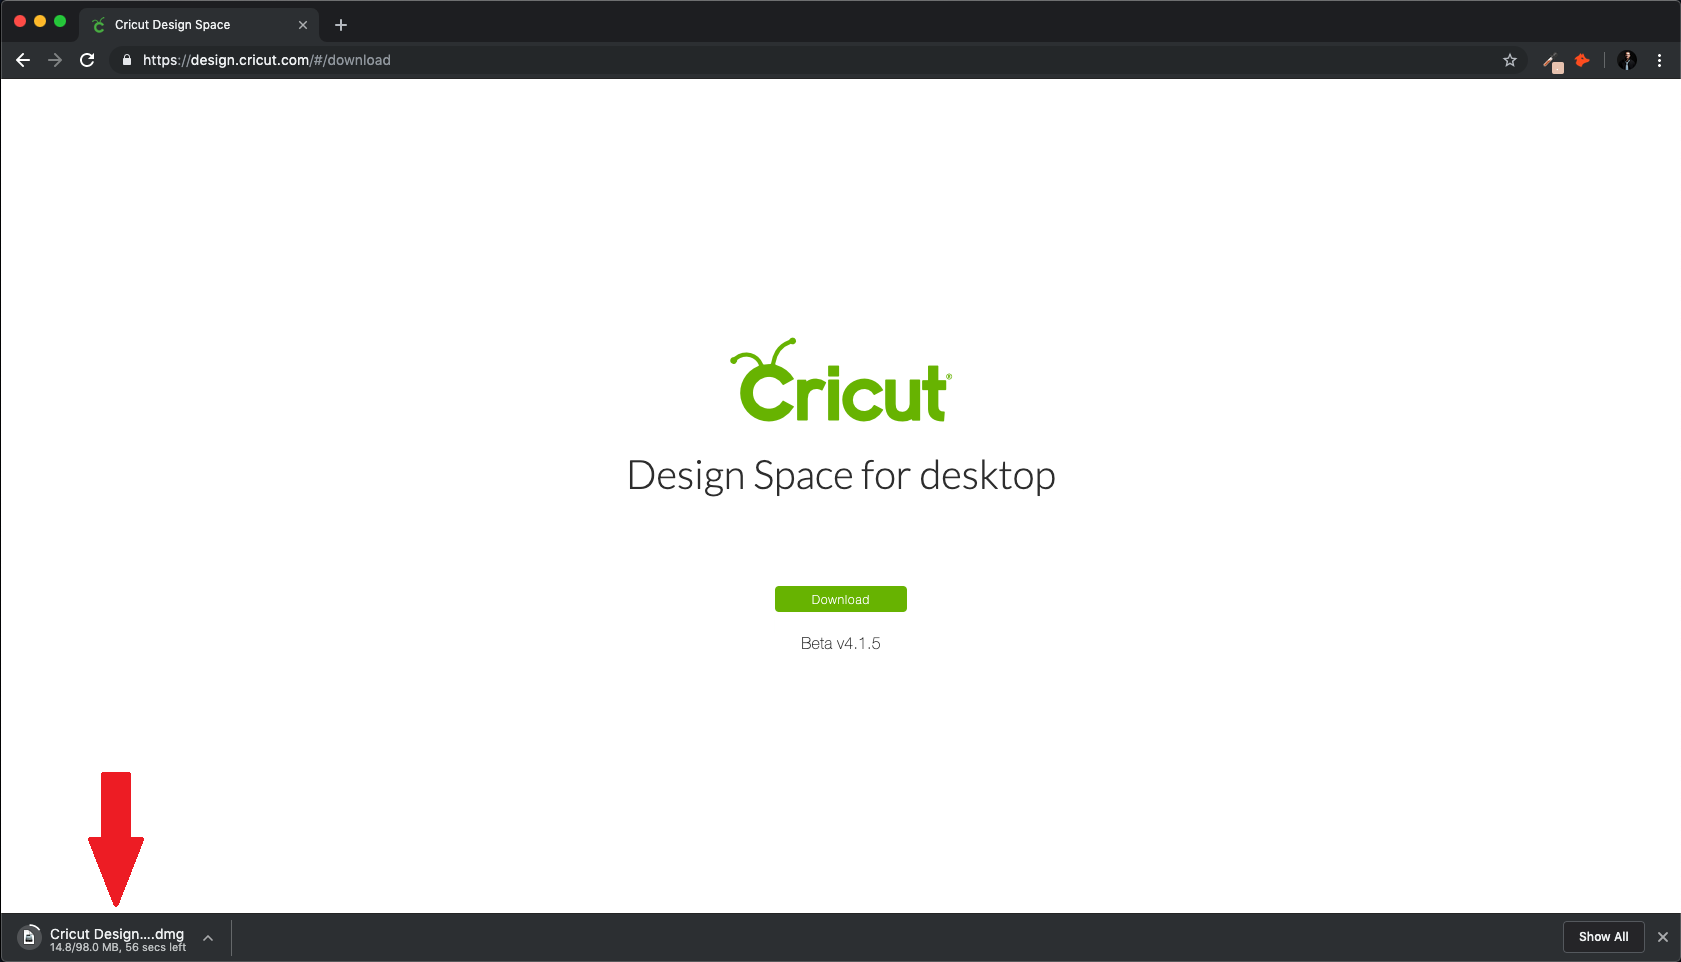 Design Space For Desktop Installation Instructions Help Center